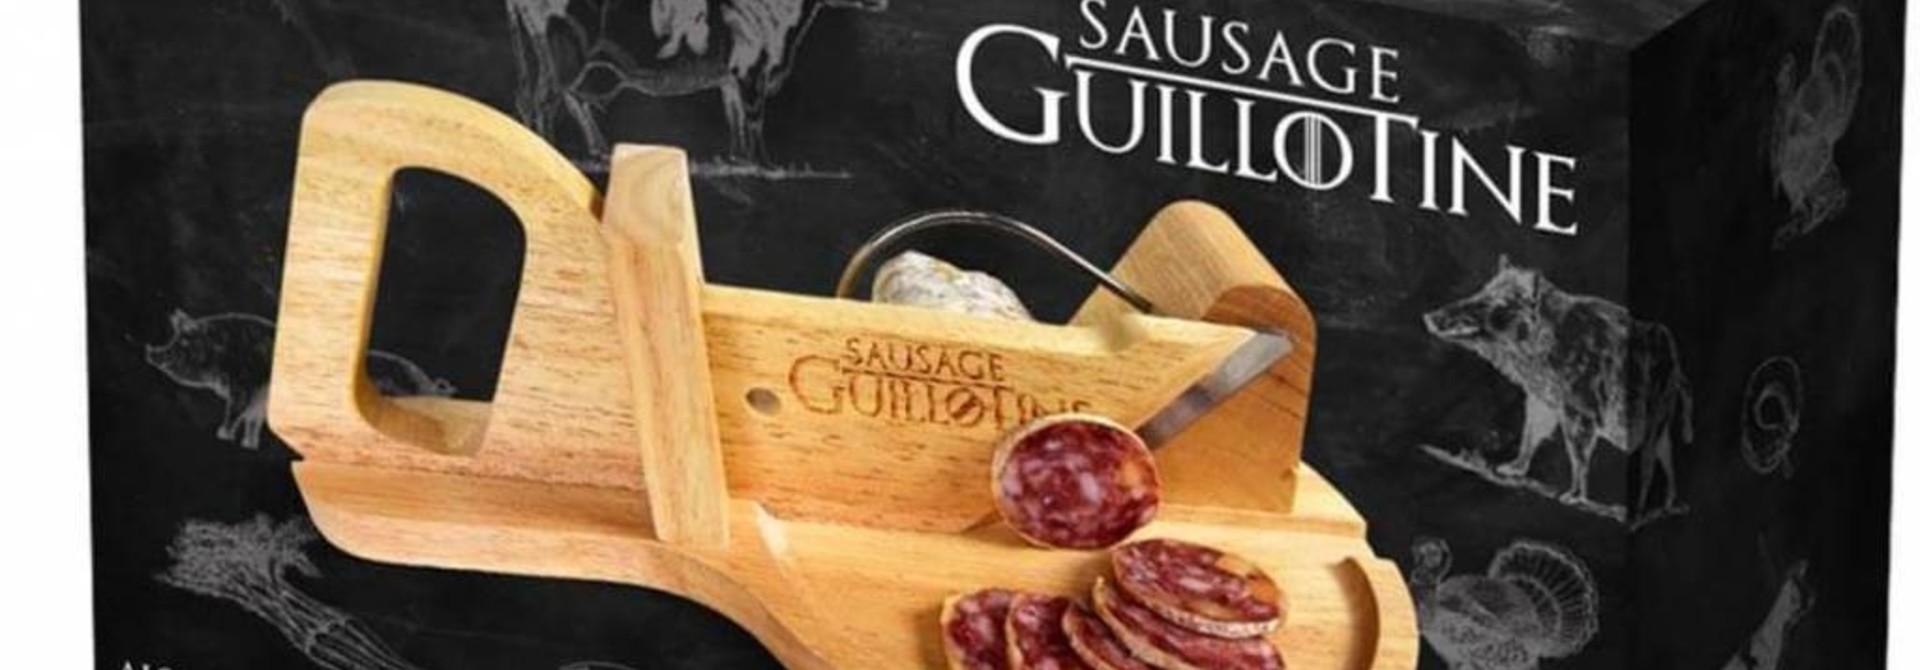 Sausage Guillotine